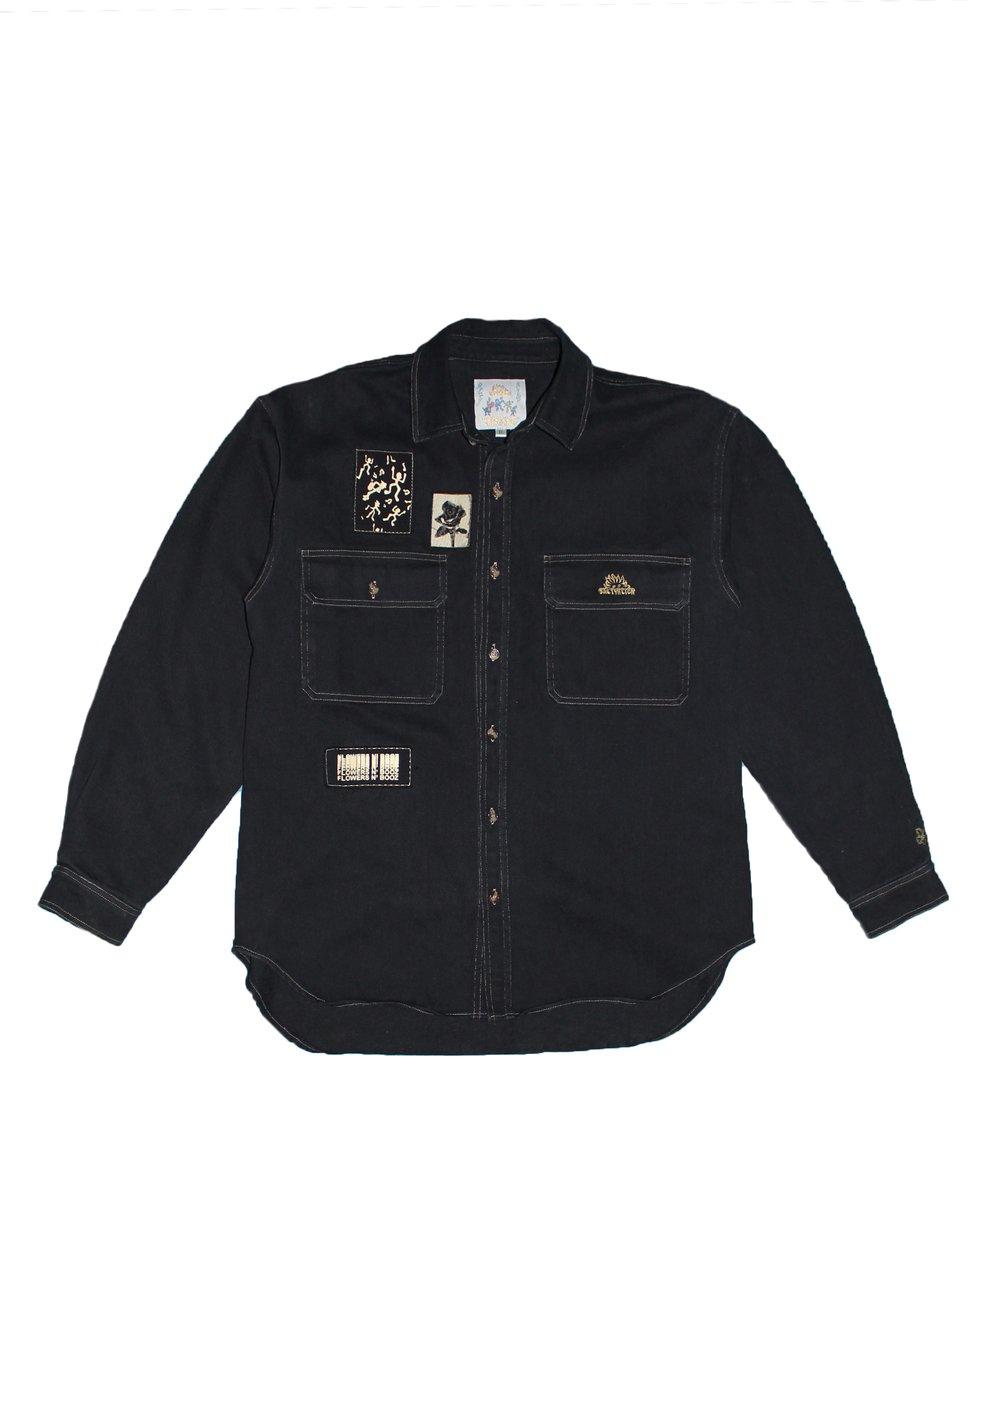 Member Jacket - Granite Black